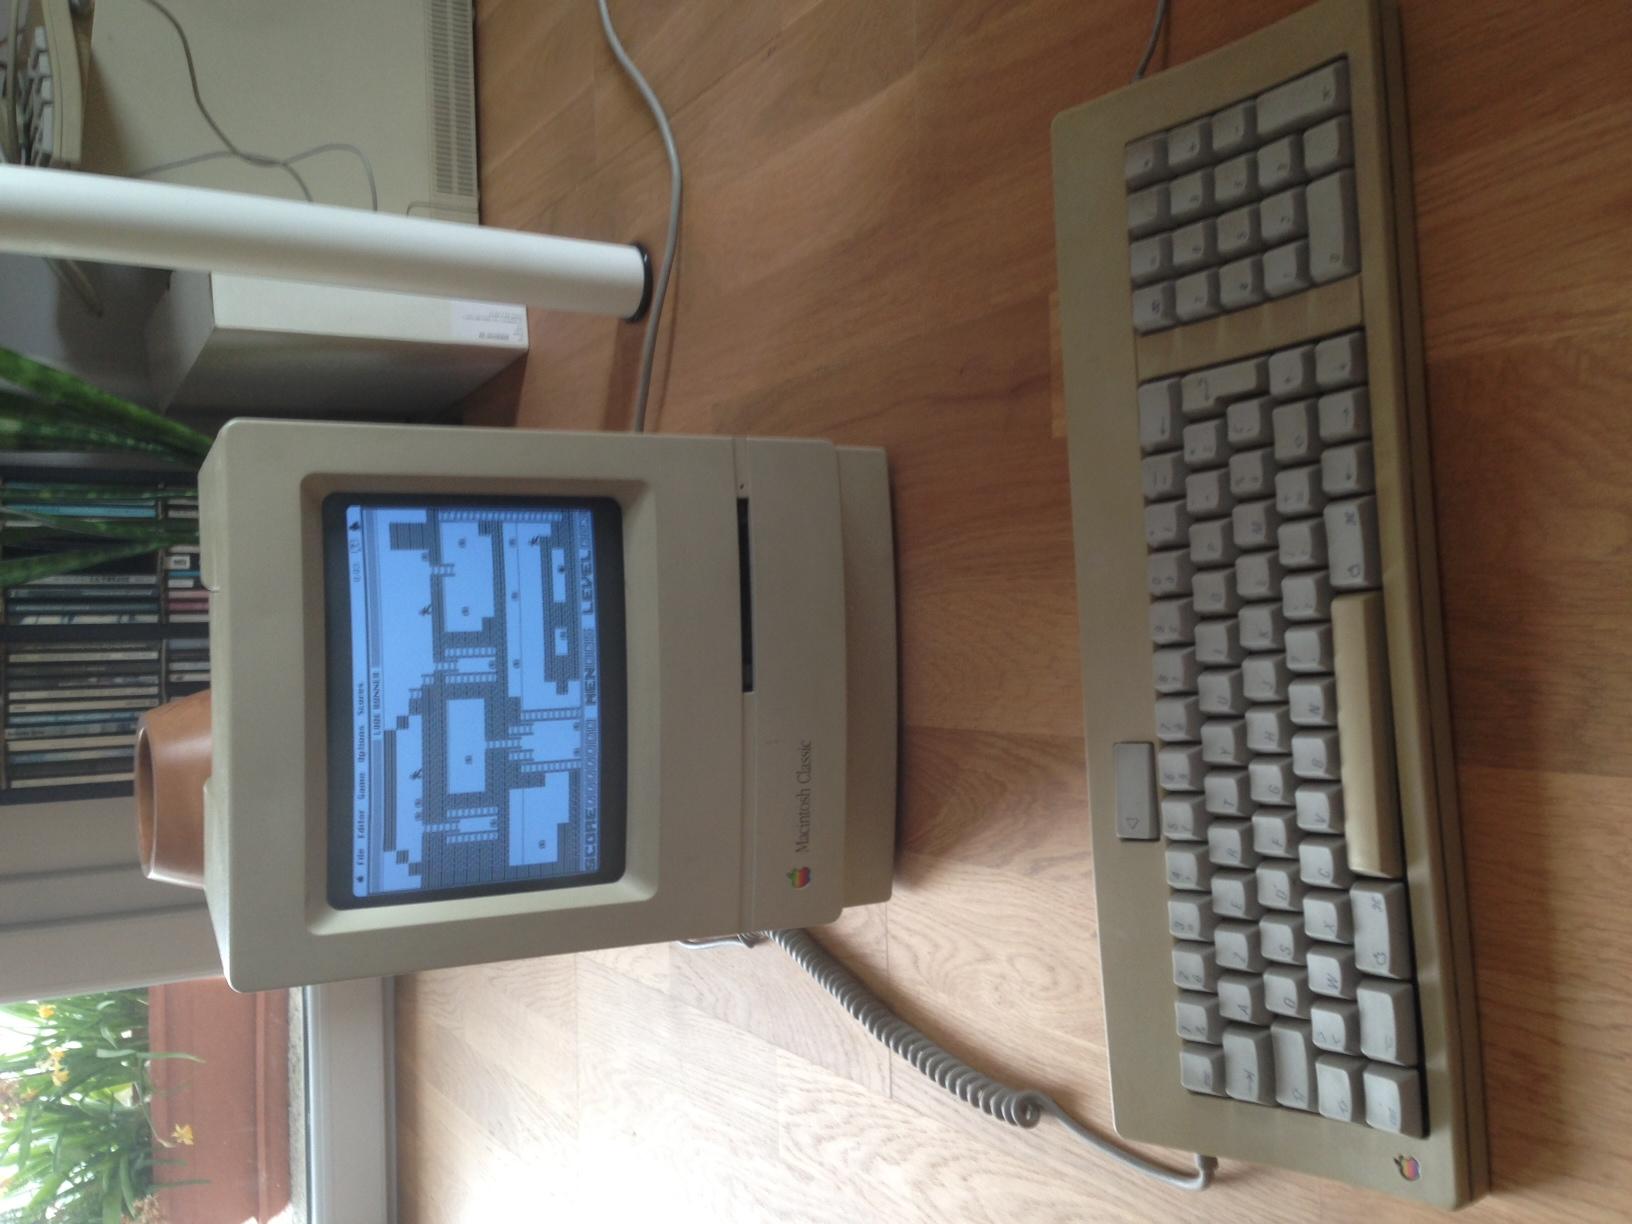 http://www.grenier-du-mac.net/photos/Classic.JPG